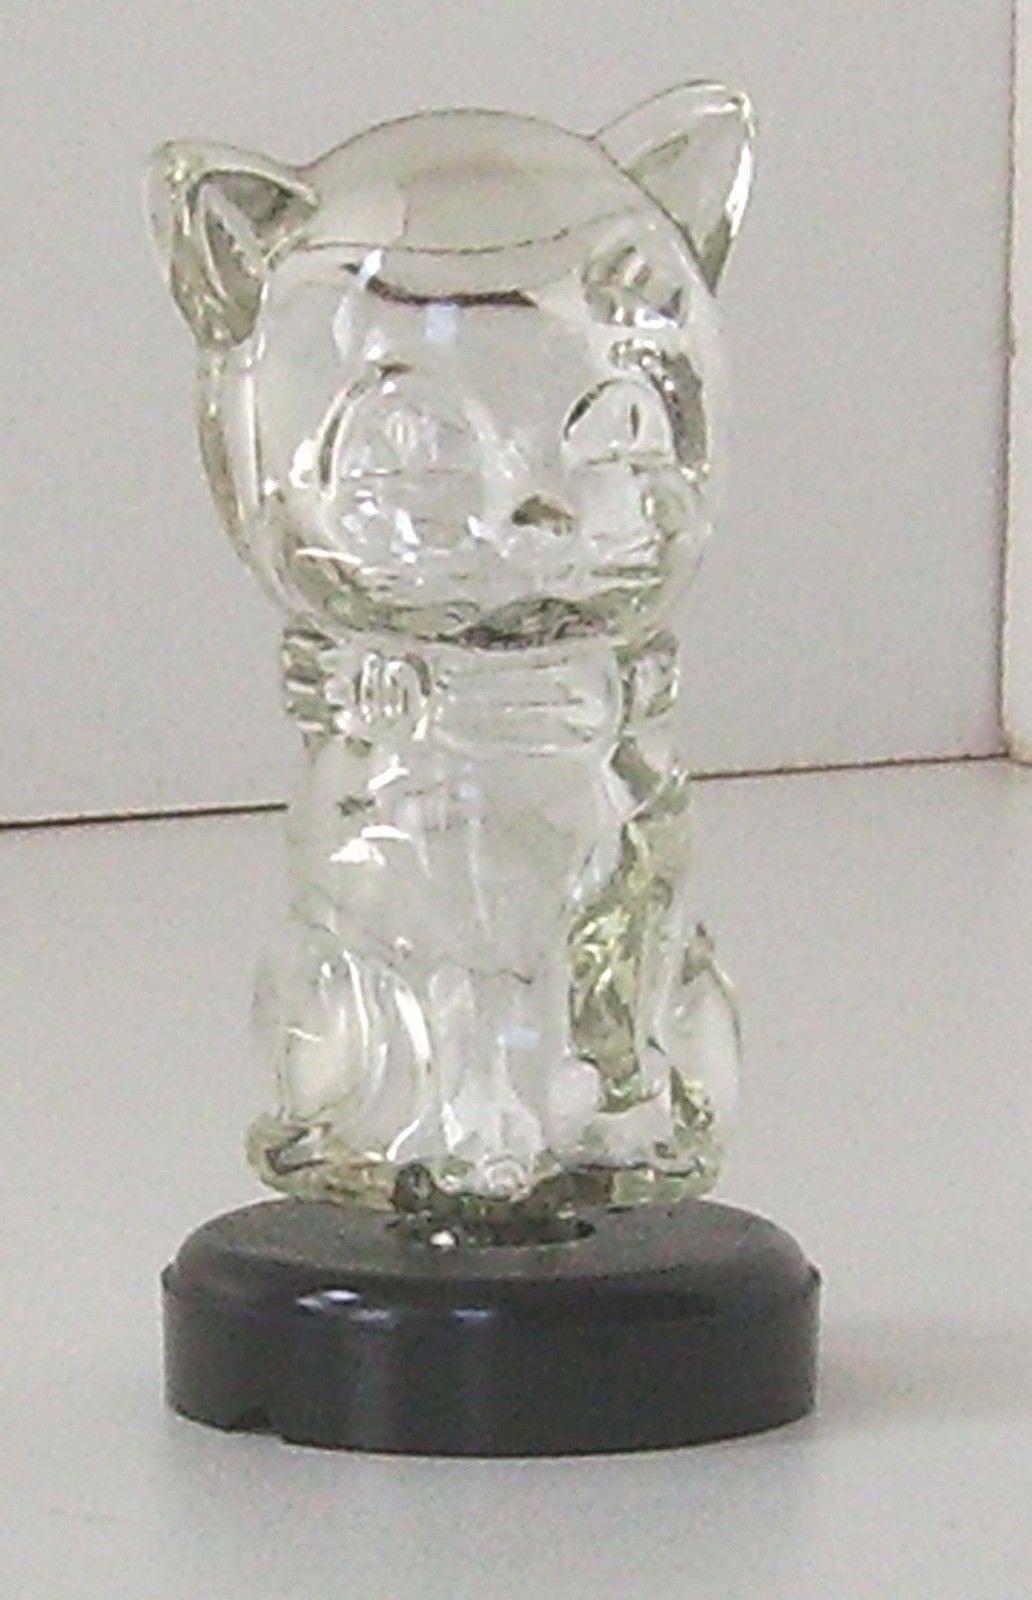 Scent bottle glass cat vintage novelty perfume ebay cat perfume